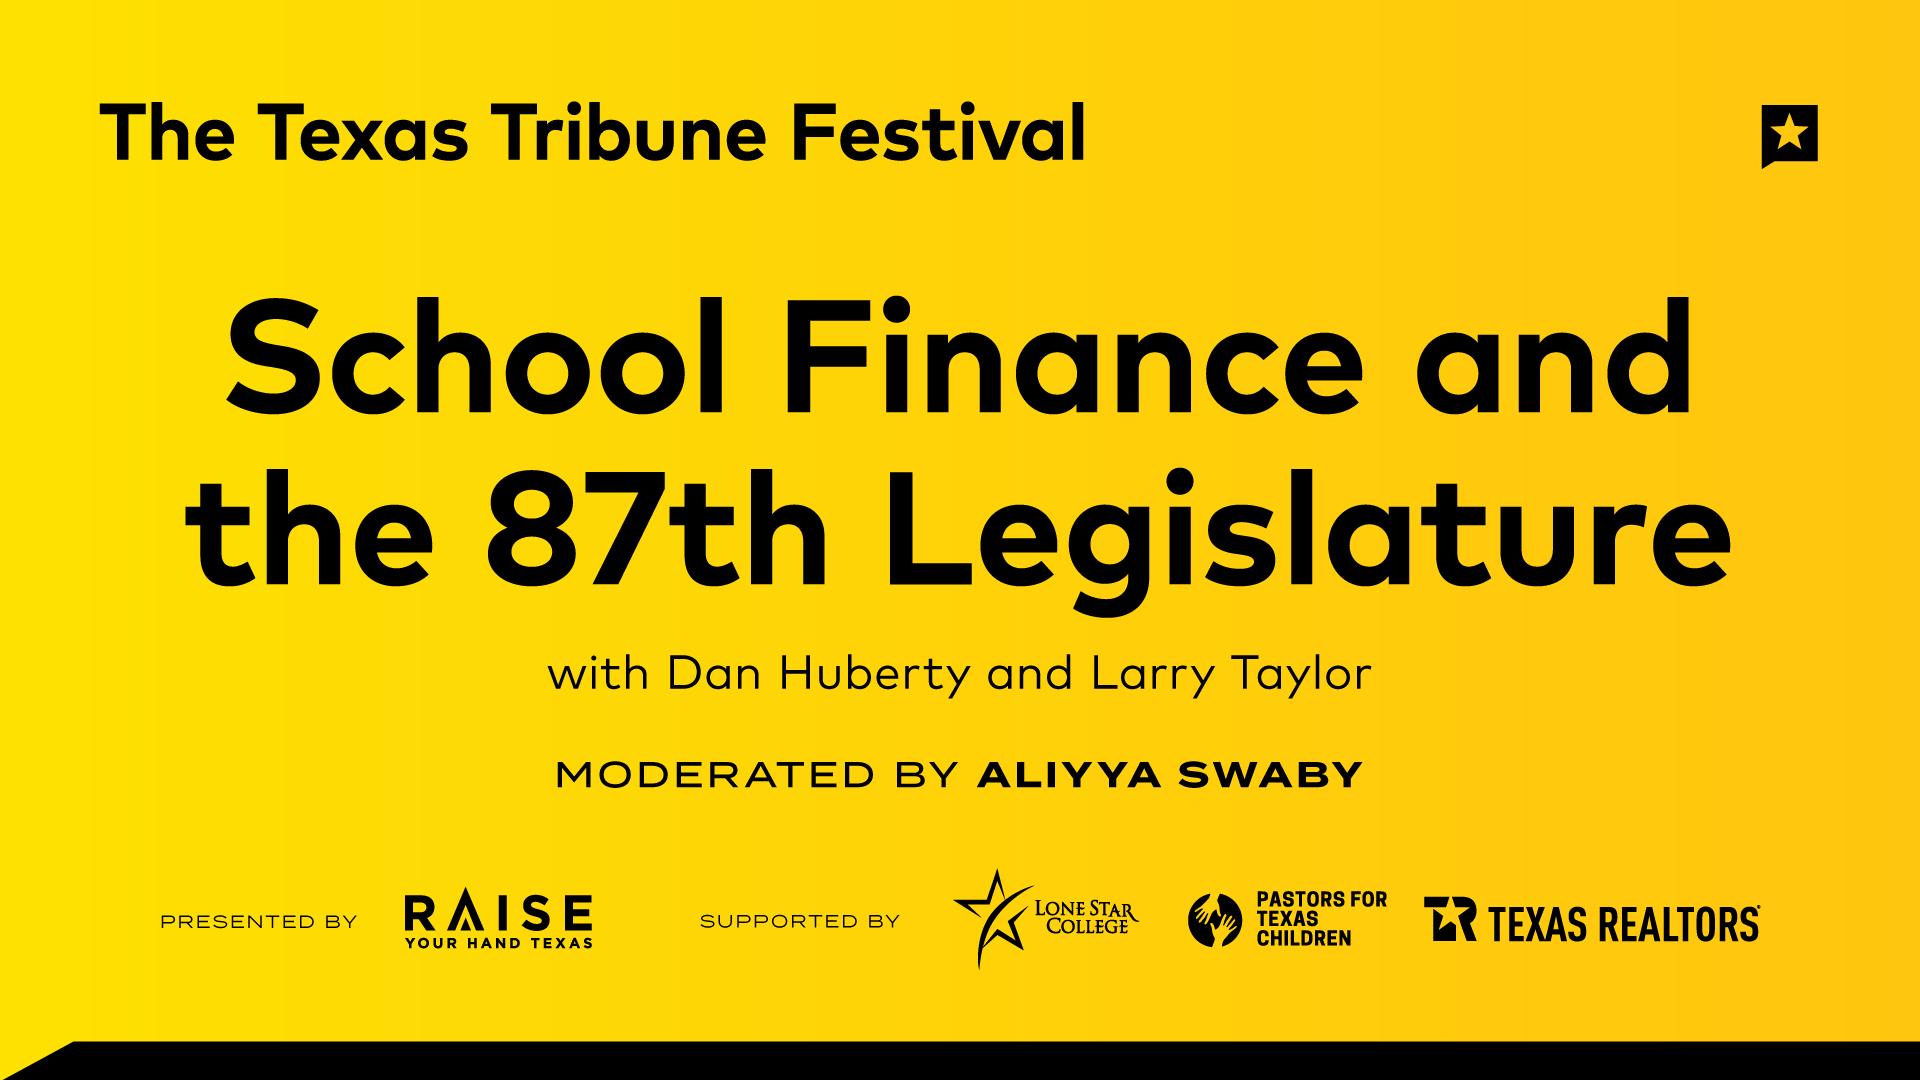 School Finance and the 87th Legislature